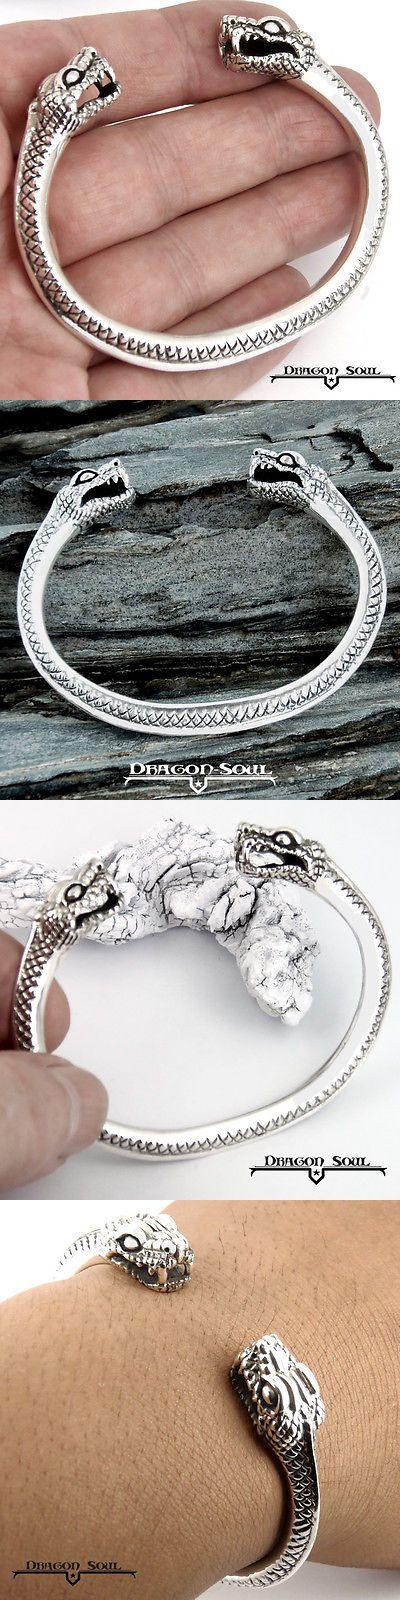 Bracelets 98483: 925 Sterling Silver Viking Midgard Serpent Torc Bracelet Dragon-Soul $15-Off! -> BUY IT NOW ONLY: $89.9 on eBay!